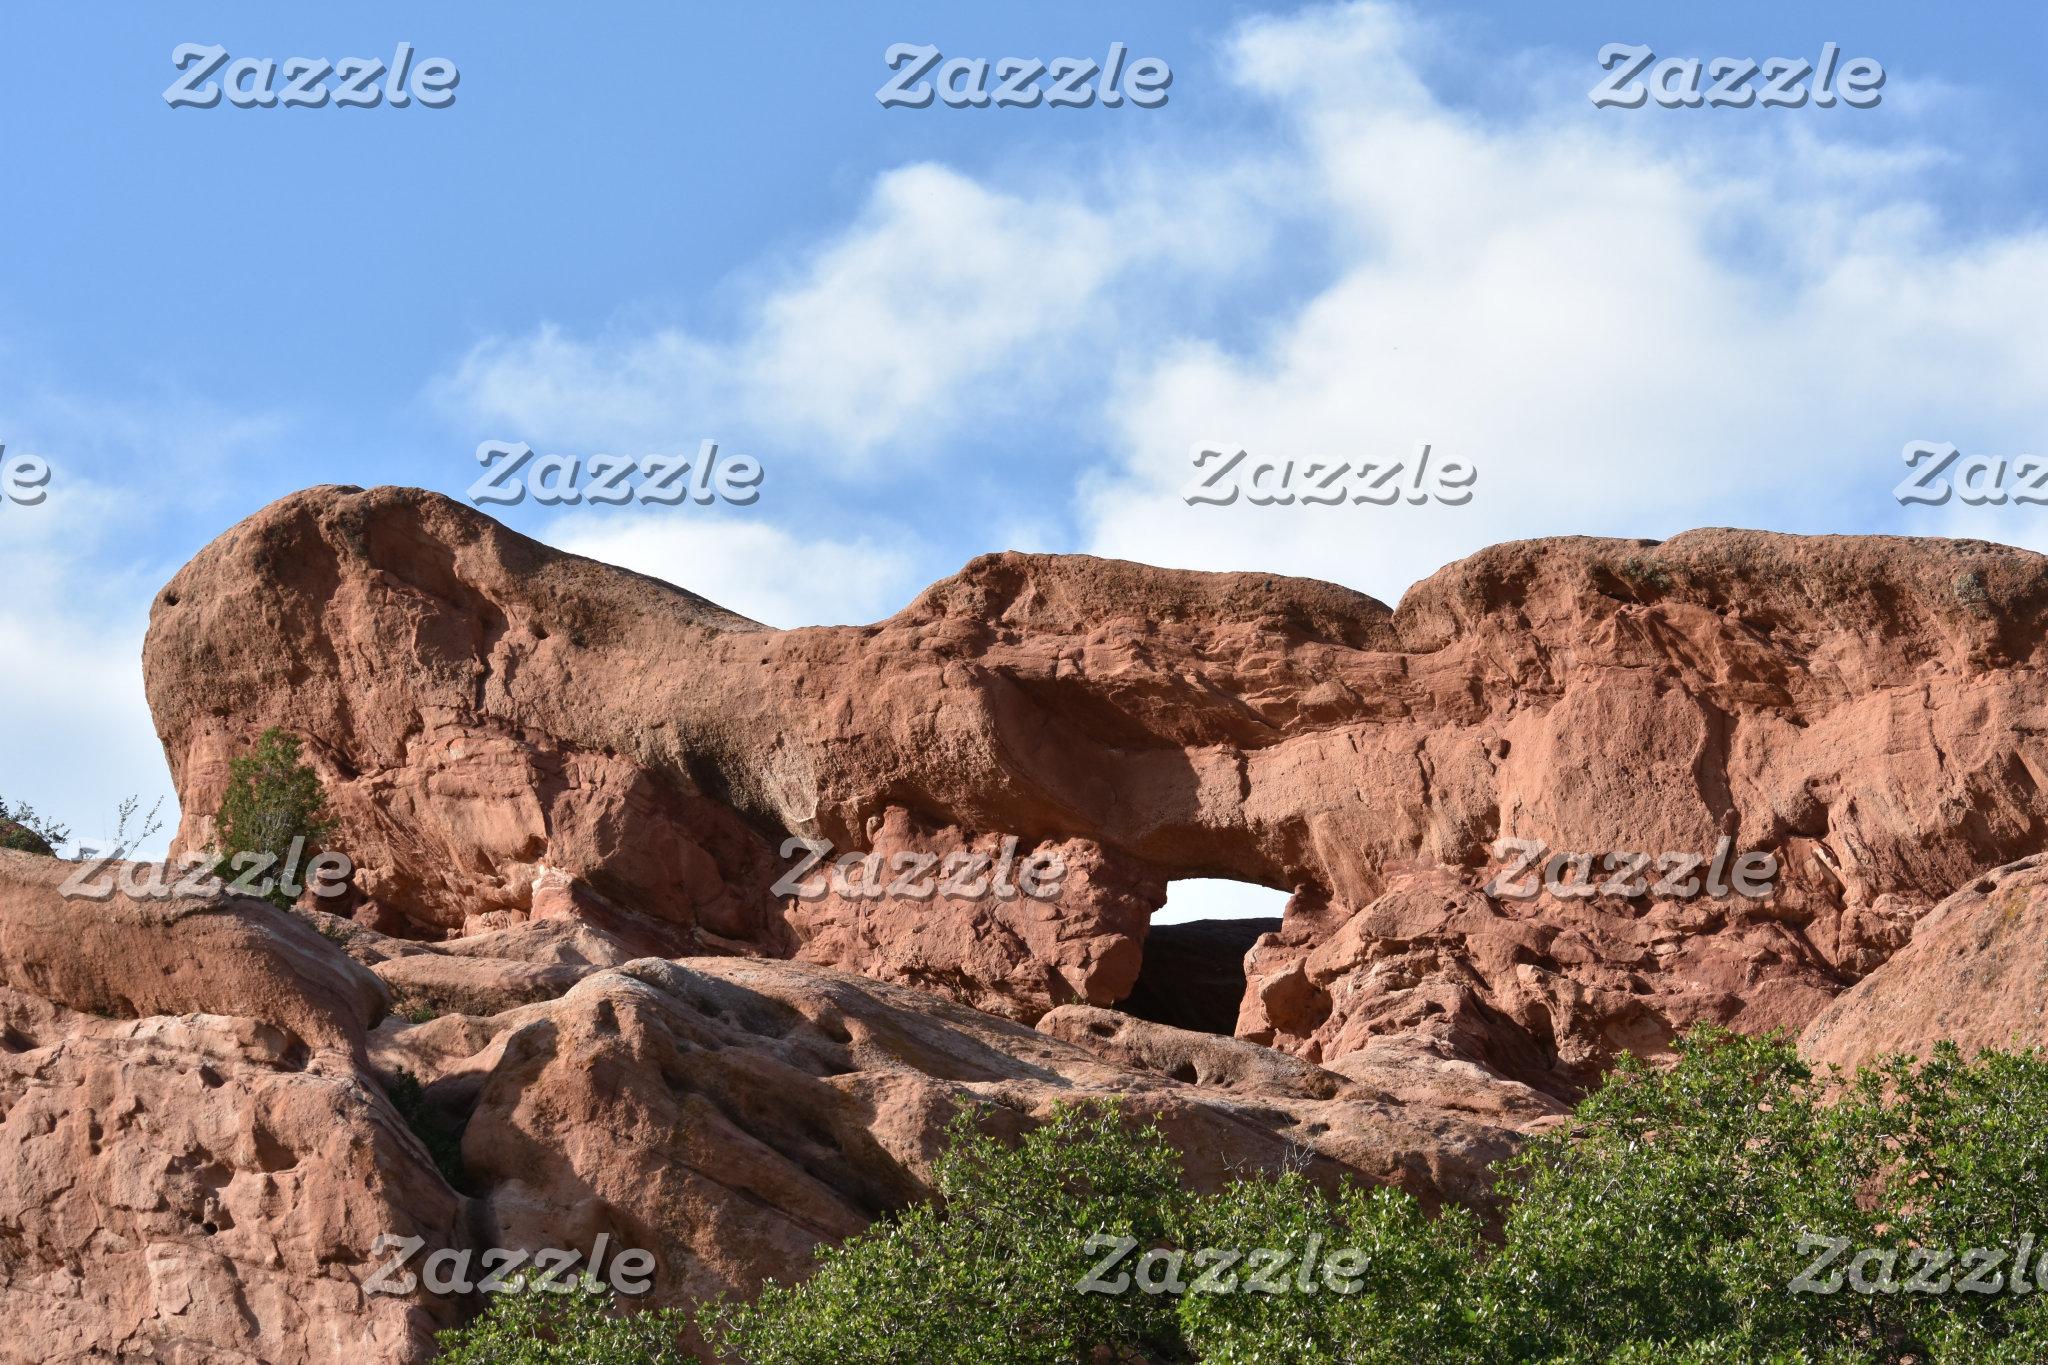 Ken Caryl Ranch